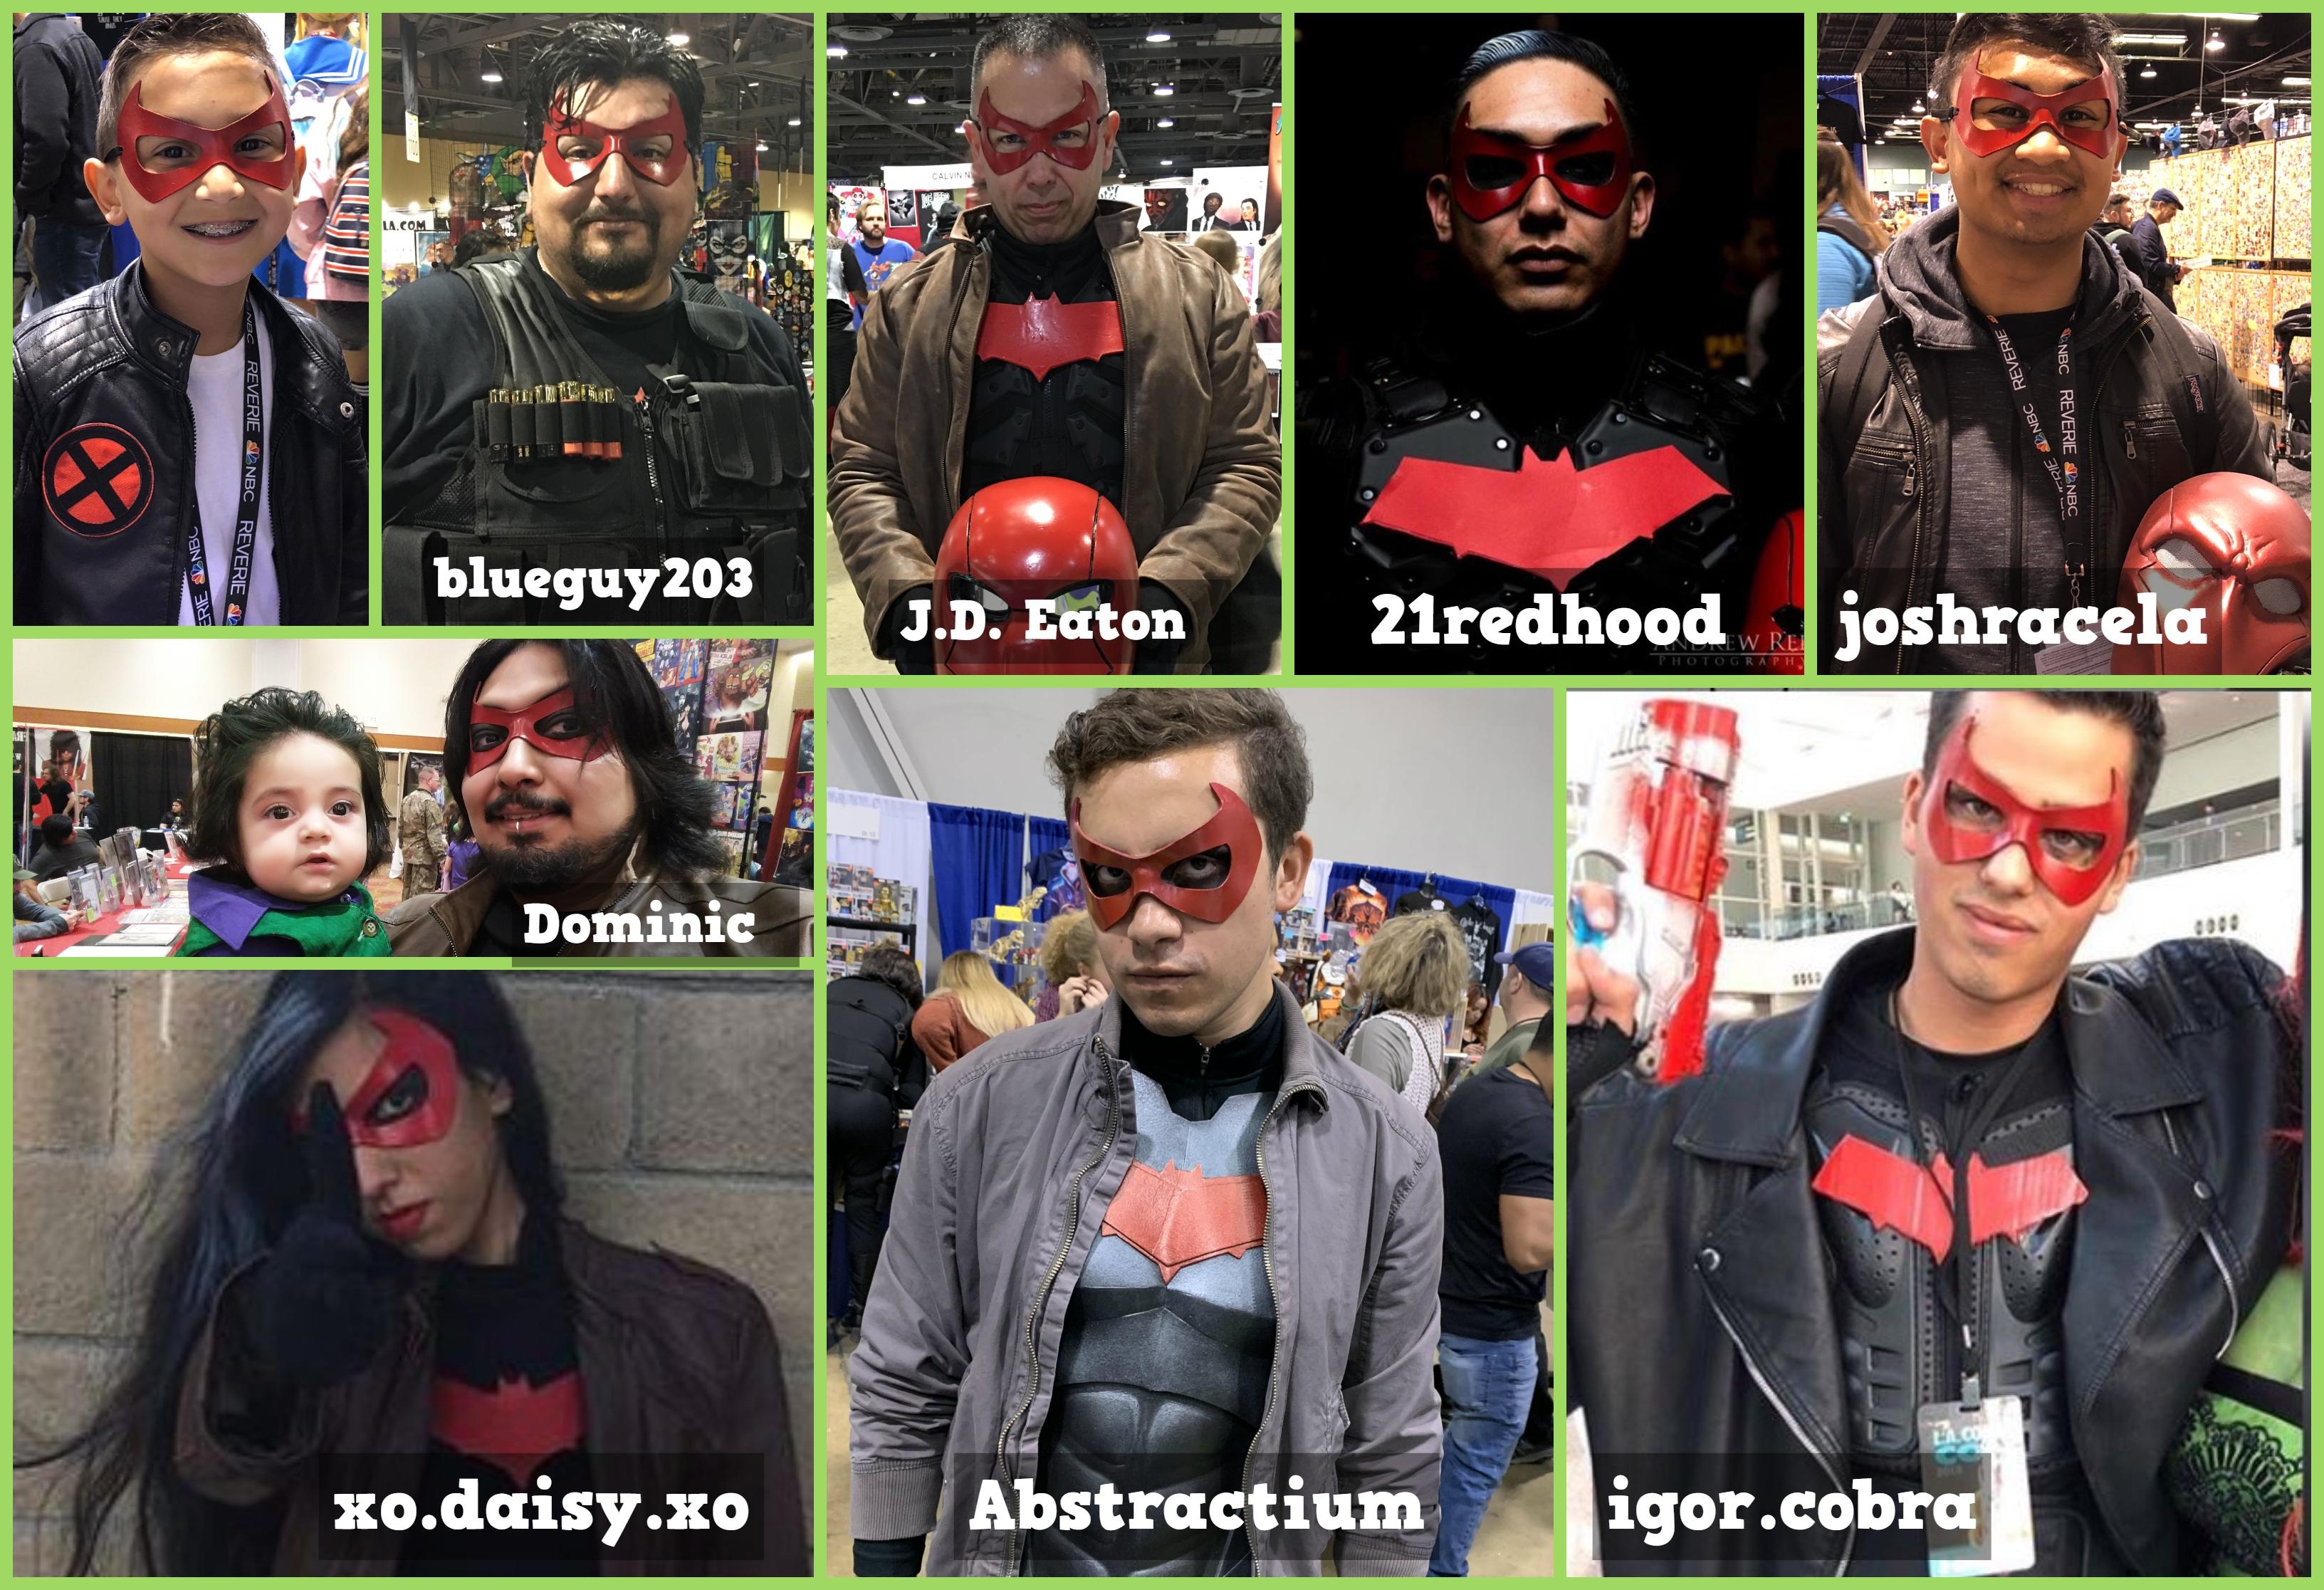 red-hood-jason-todd-cosplay-collage.jpg